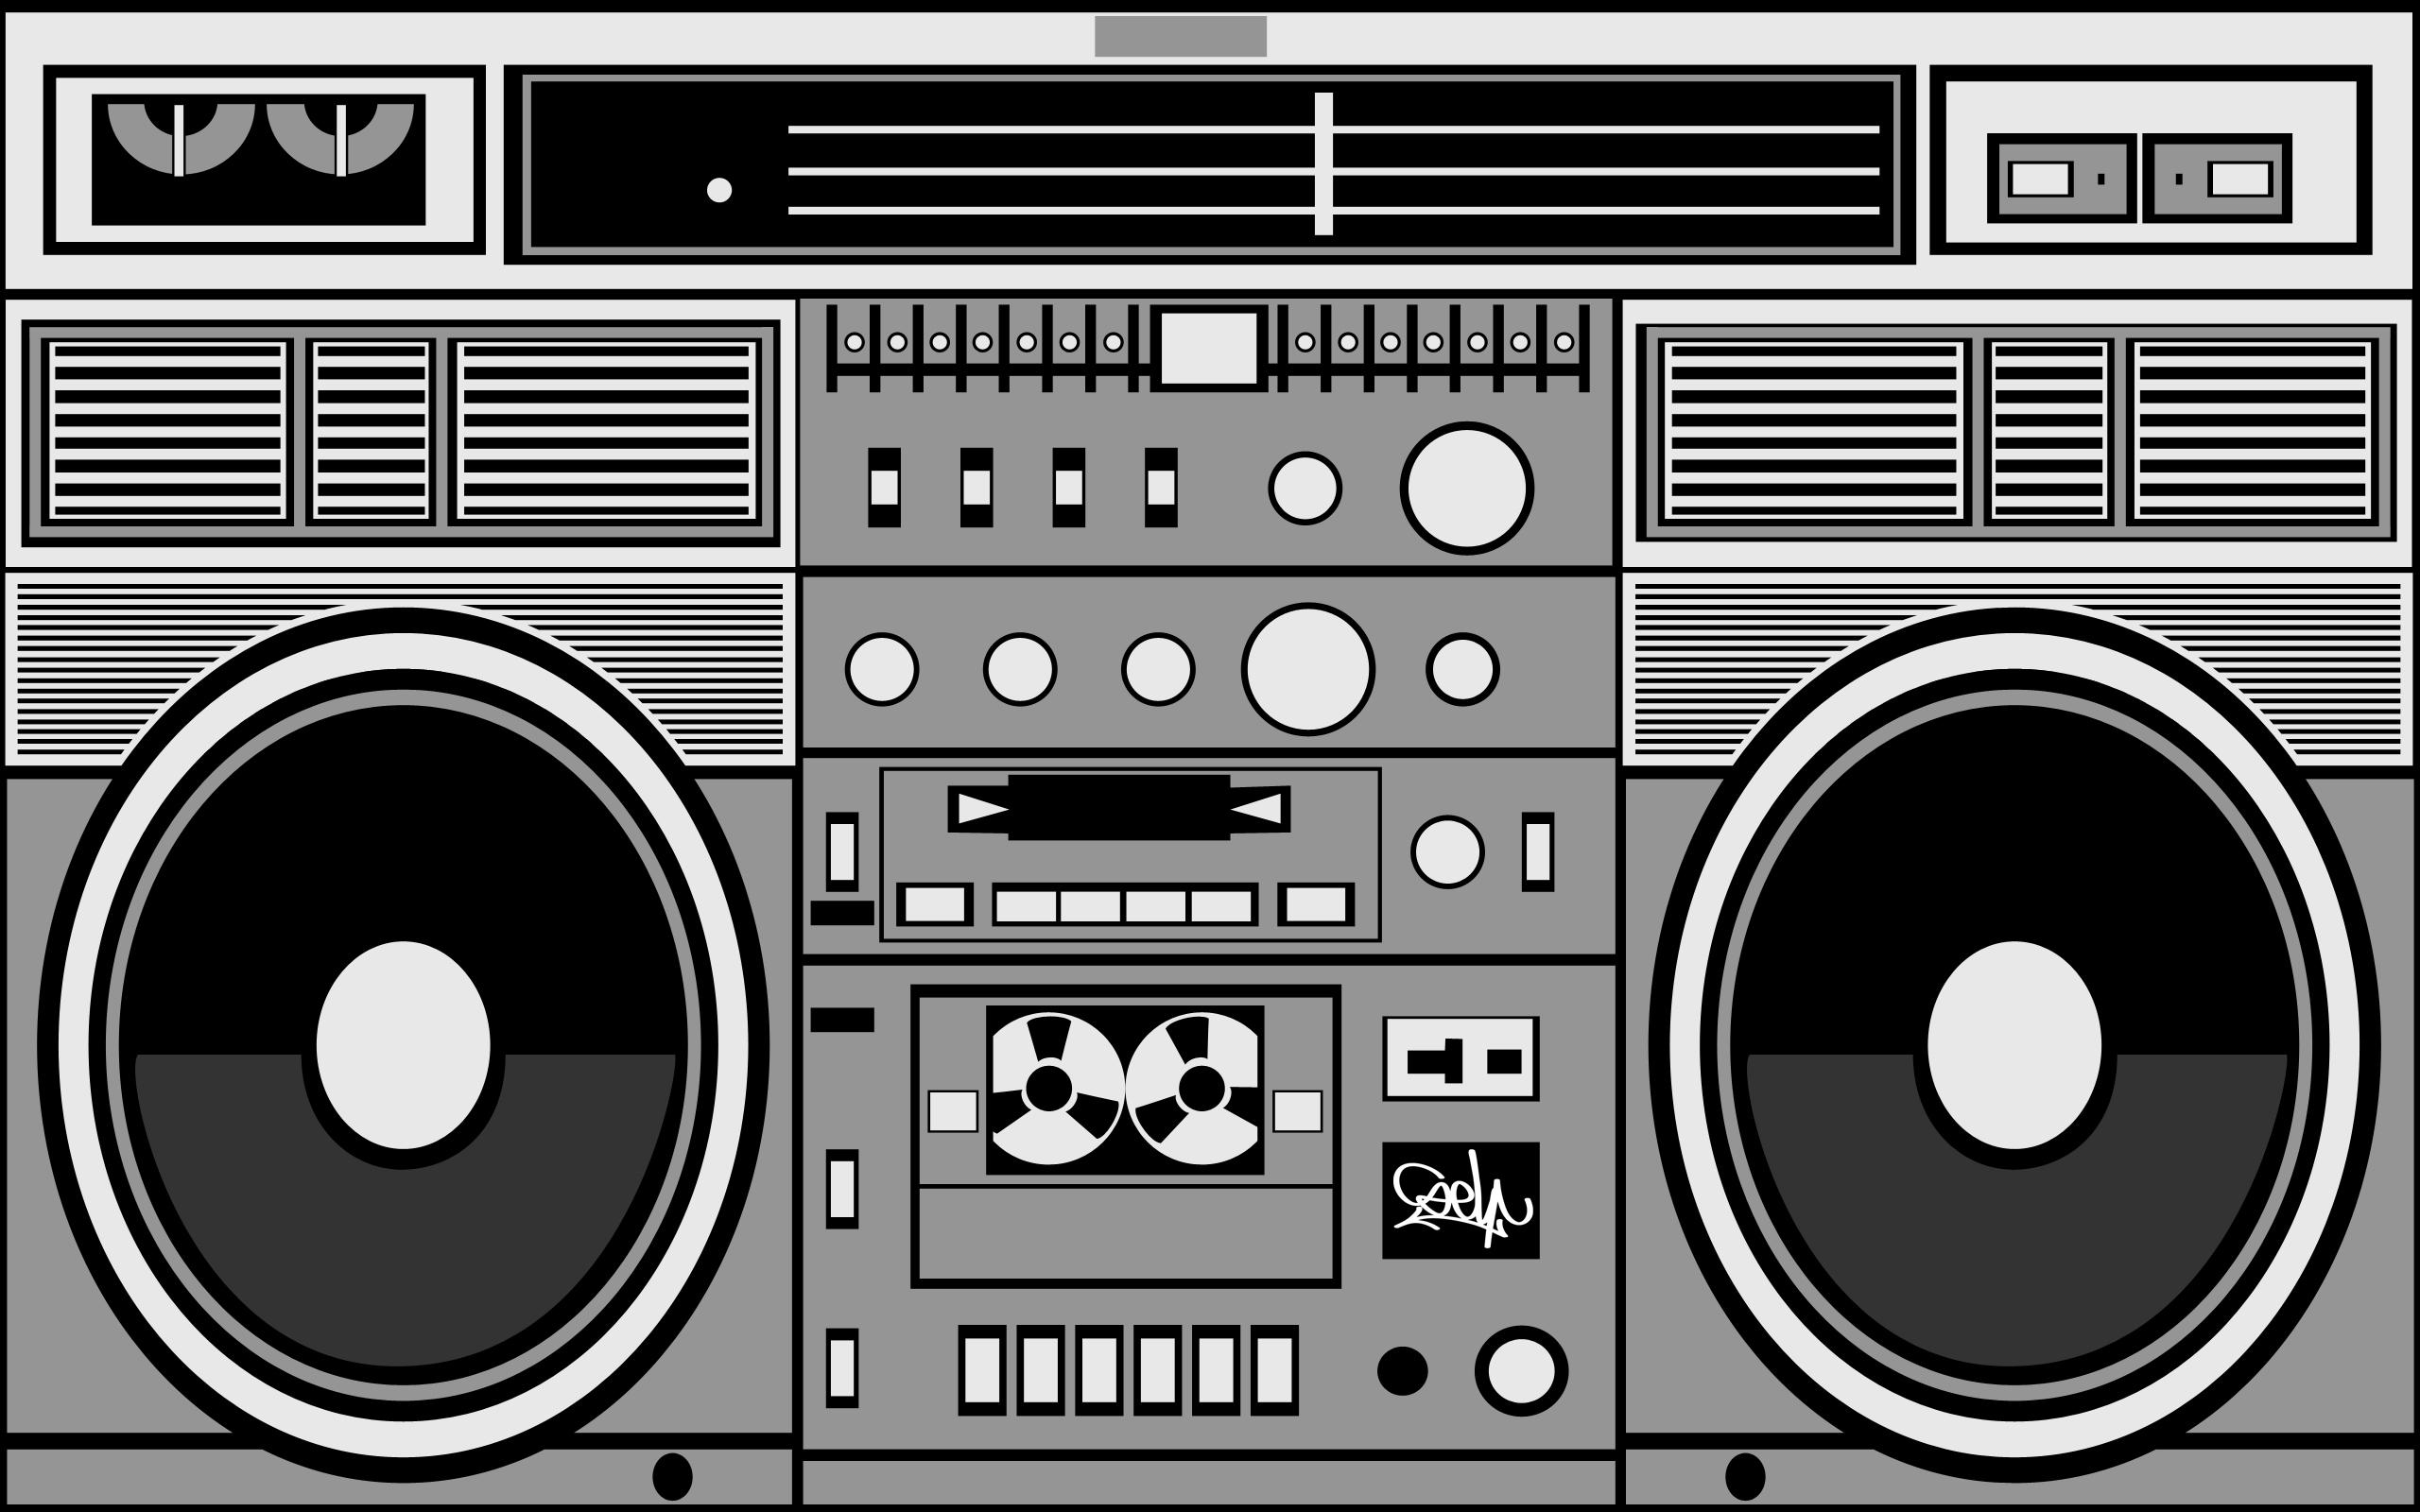 BOYS hip hop hip hop rap radio stereo music wallpaper background 2560x1600